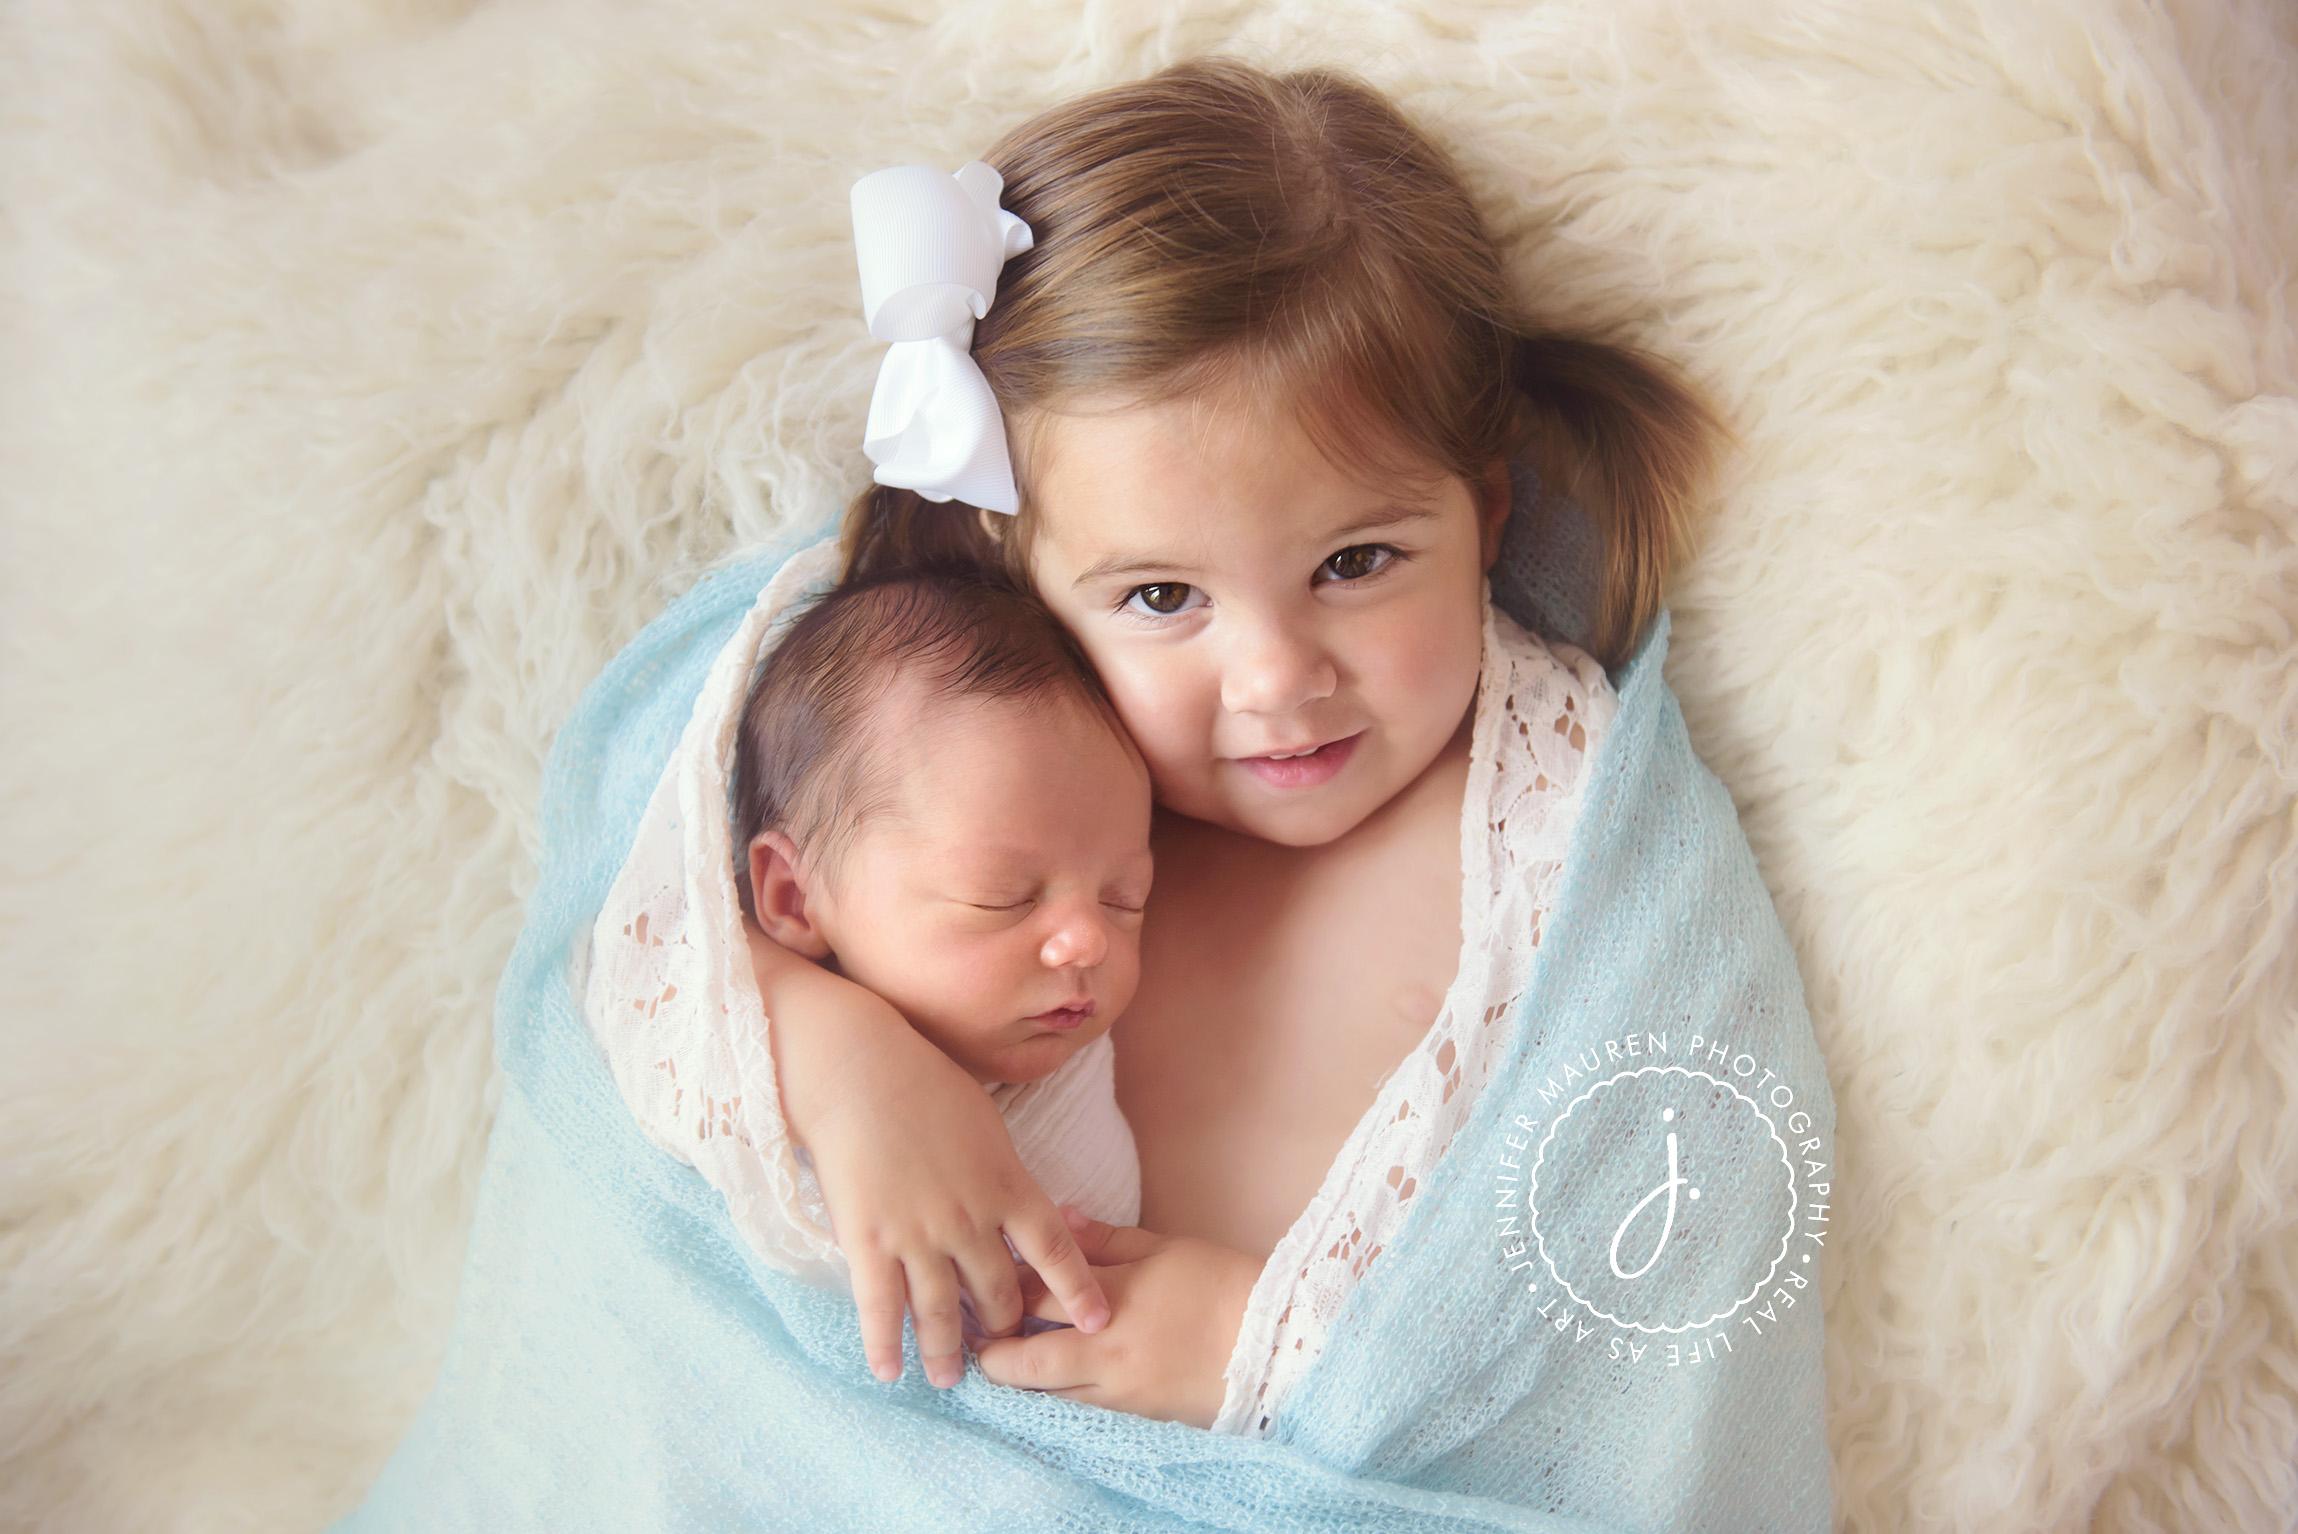 newborn baby and sibling photo